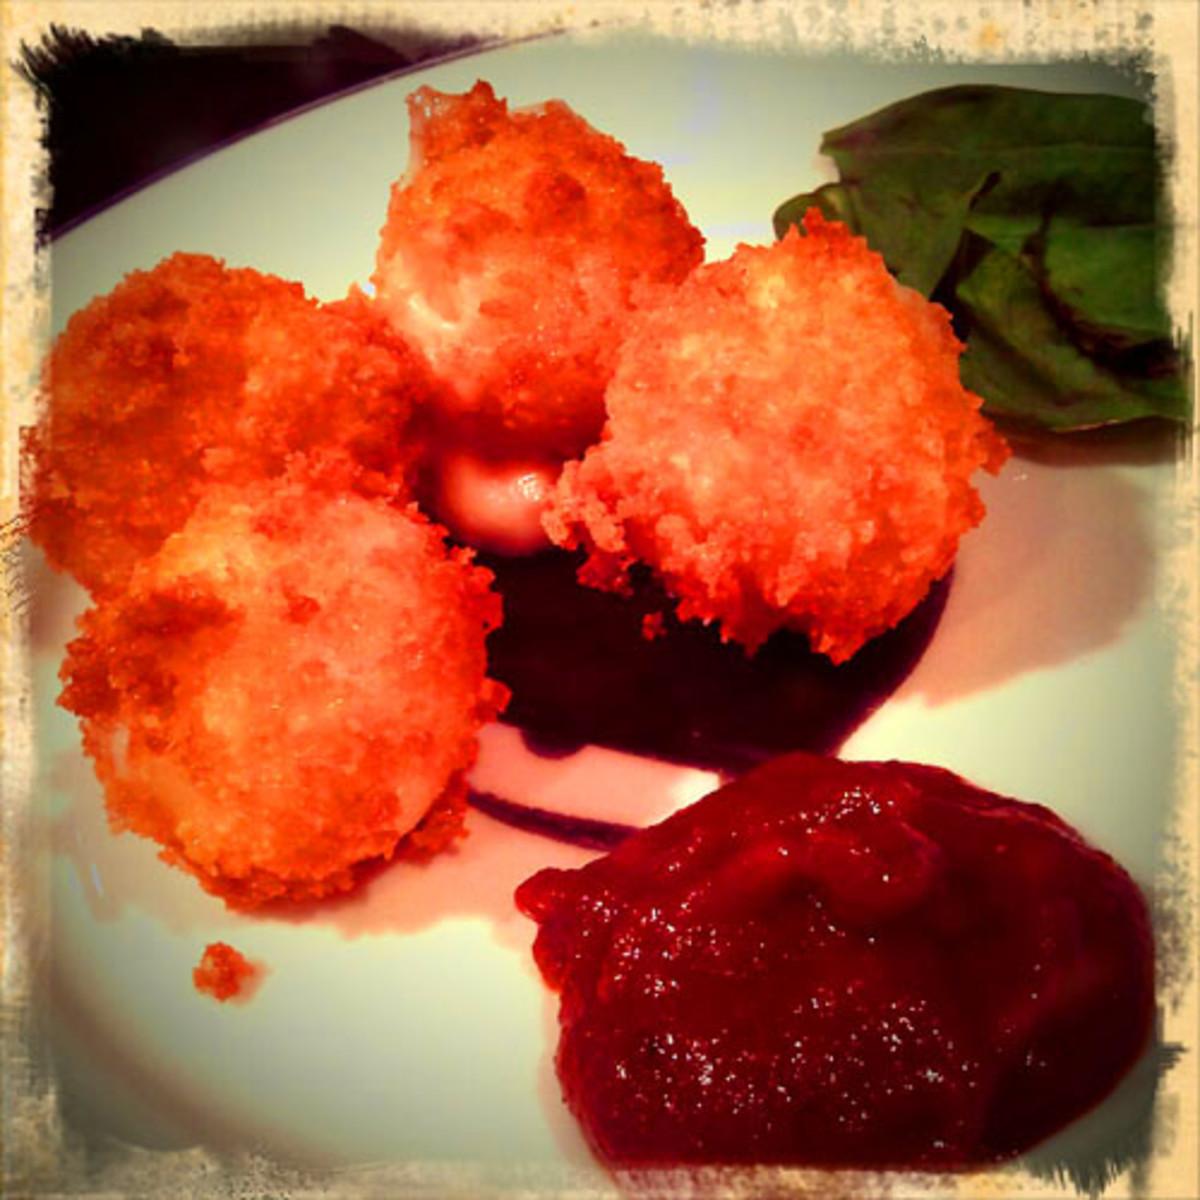 Moneyball_panko-encrusted bocanccini cheese w homemade ketchup